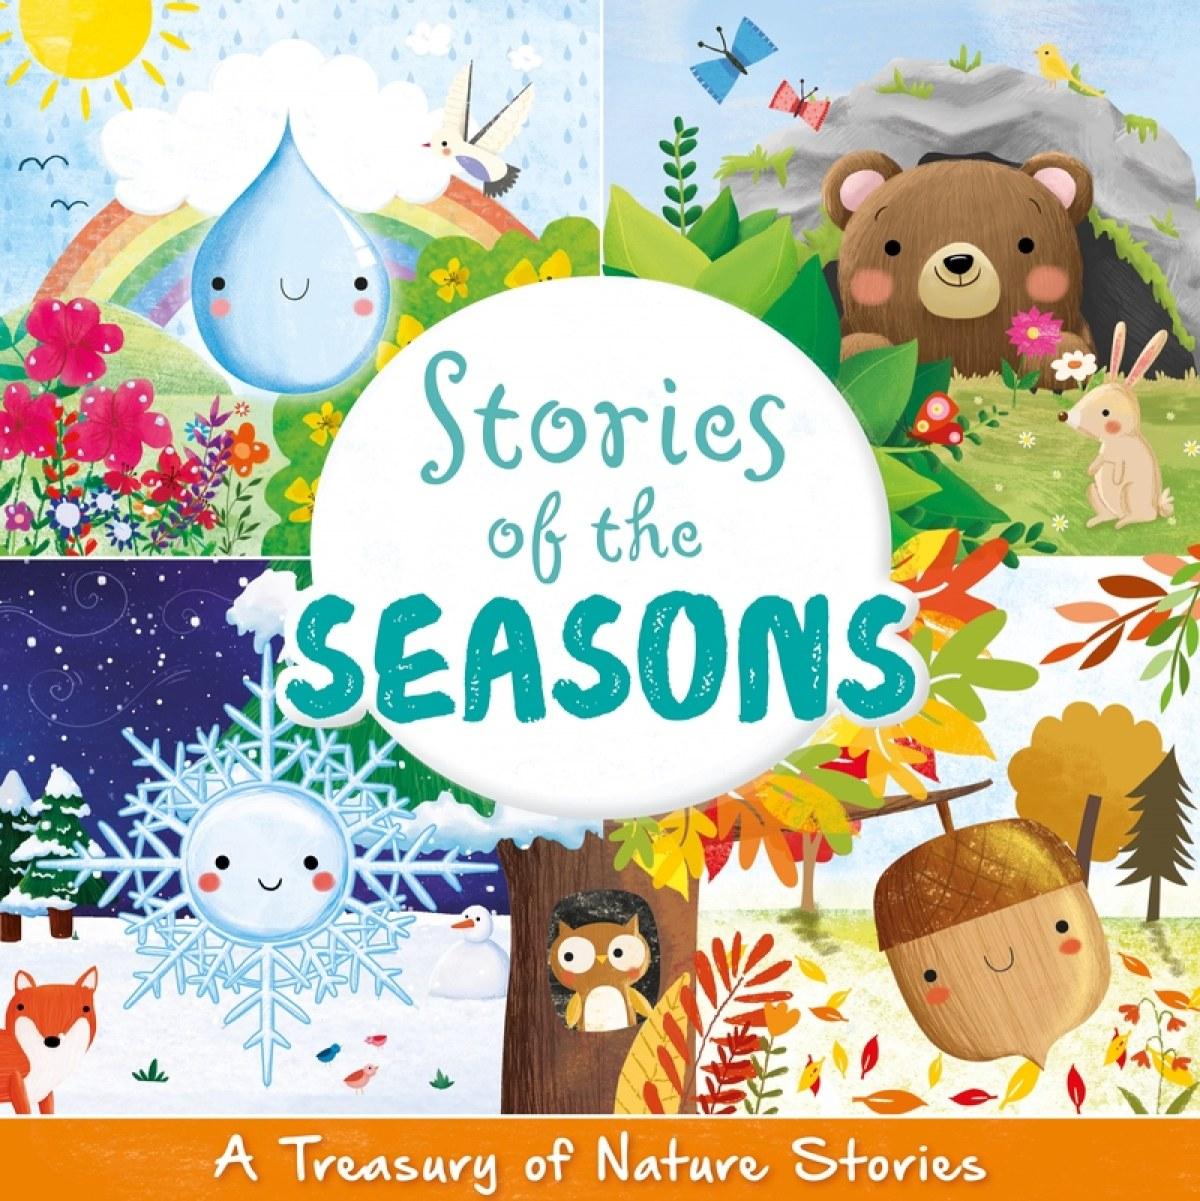 Stories of the Season